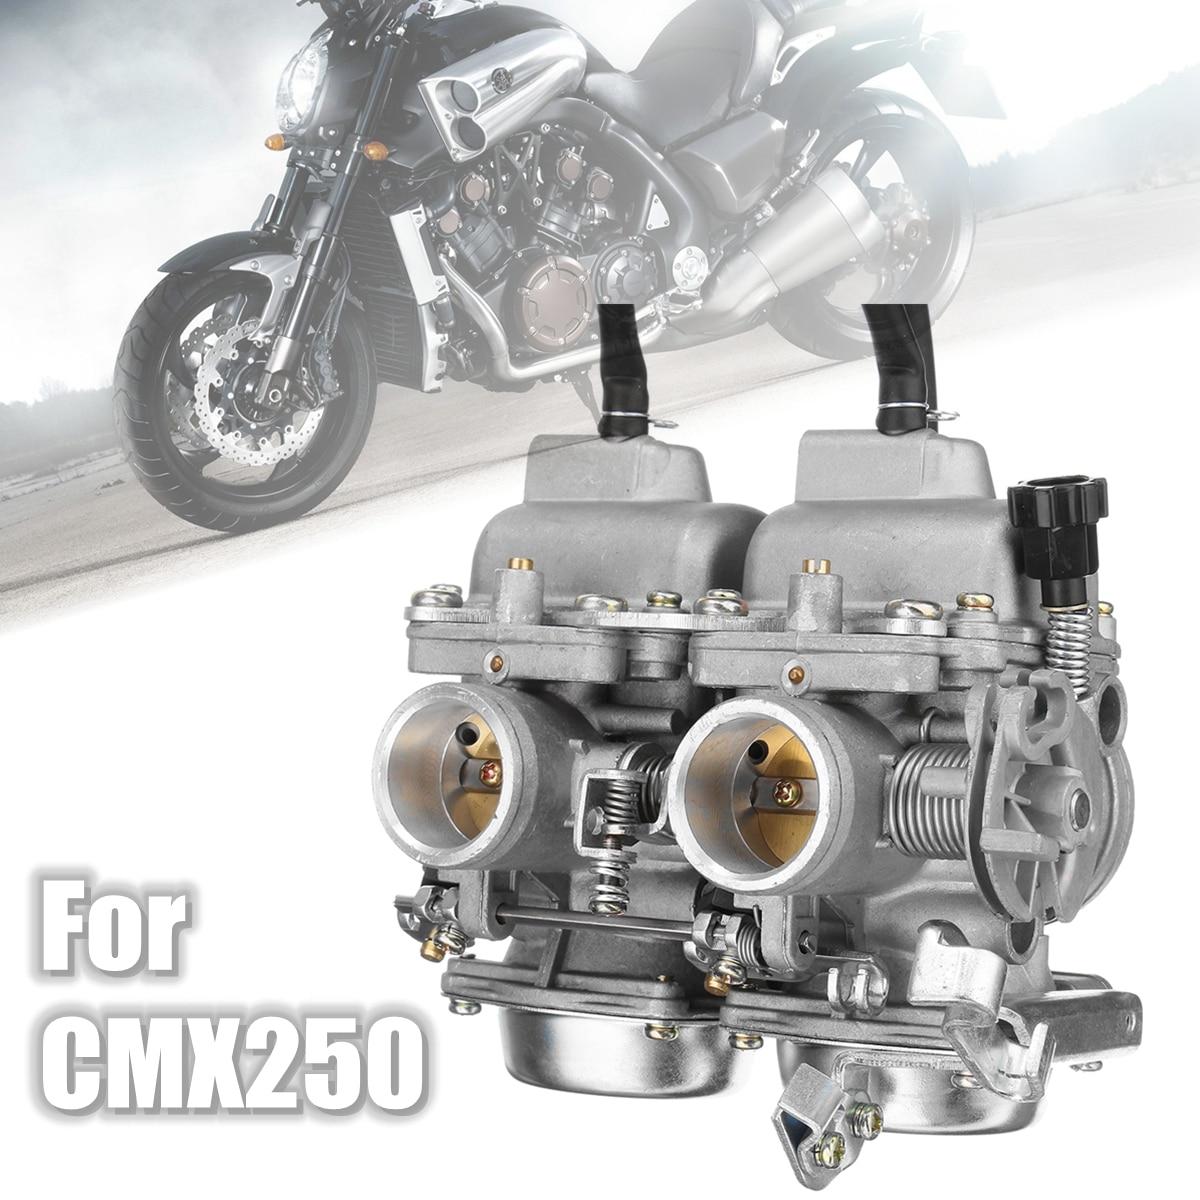 Filtro de combustible de montaje de cámara de carburador doble para Honda Rebel CA CMX 250 C CMX250 CA250